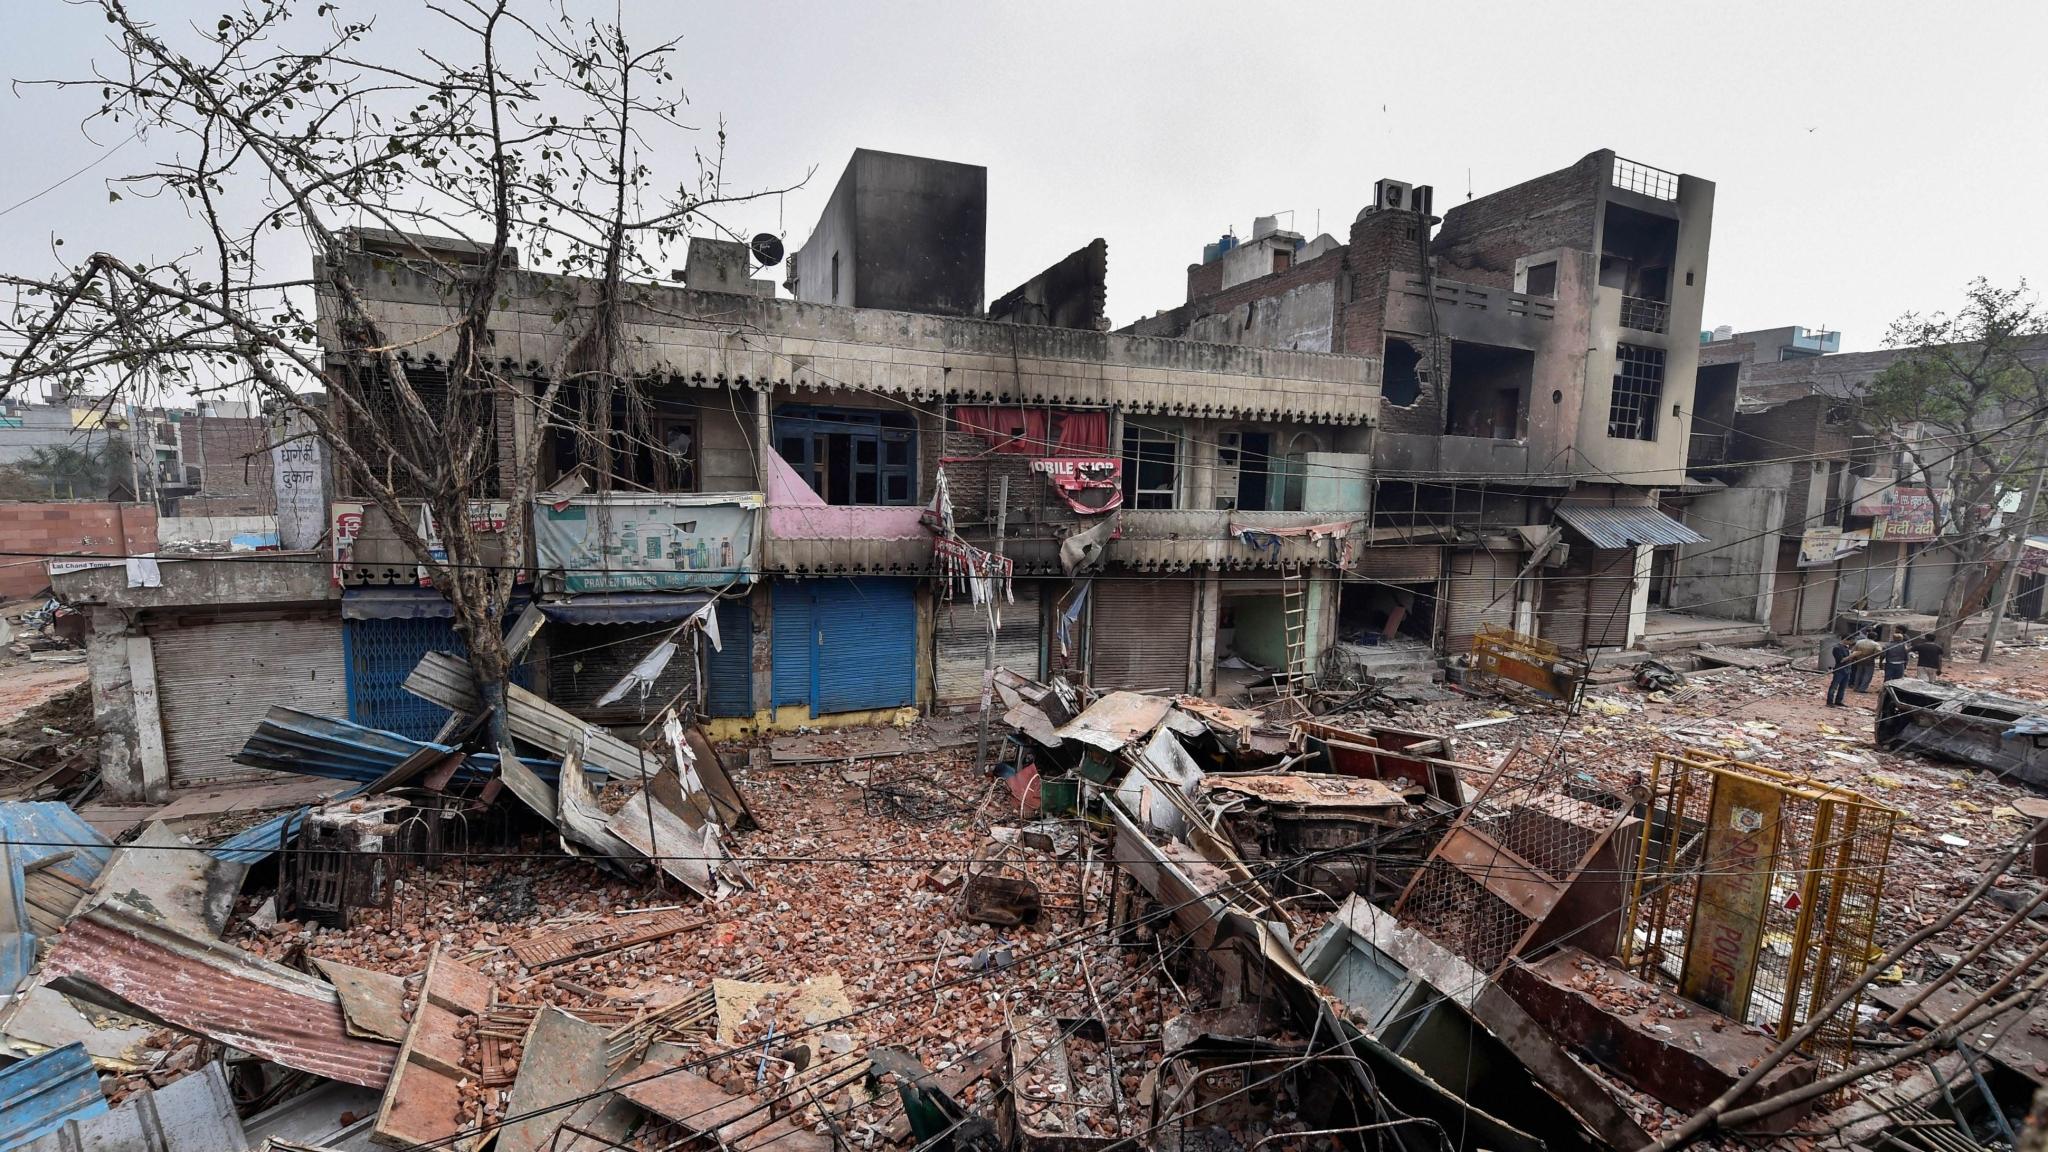 In Fresh Case of Violence, Man Beaten To Death in Northeast Delhi